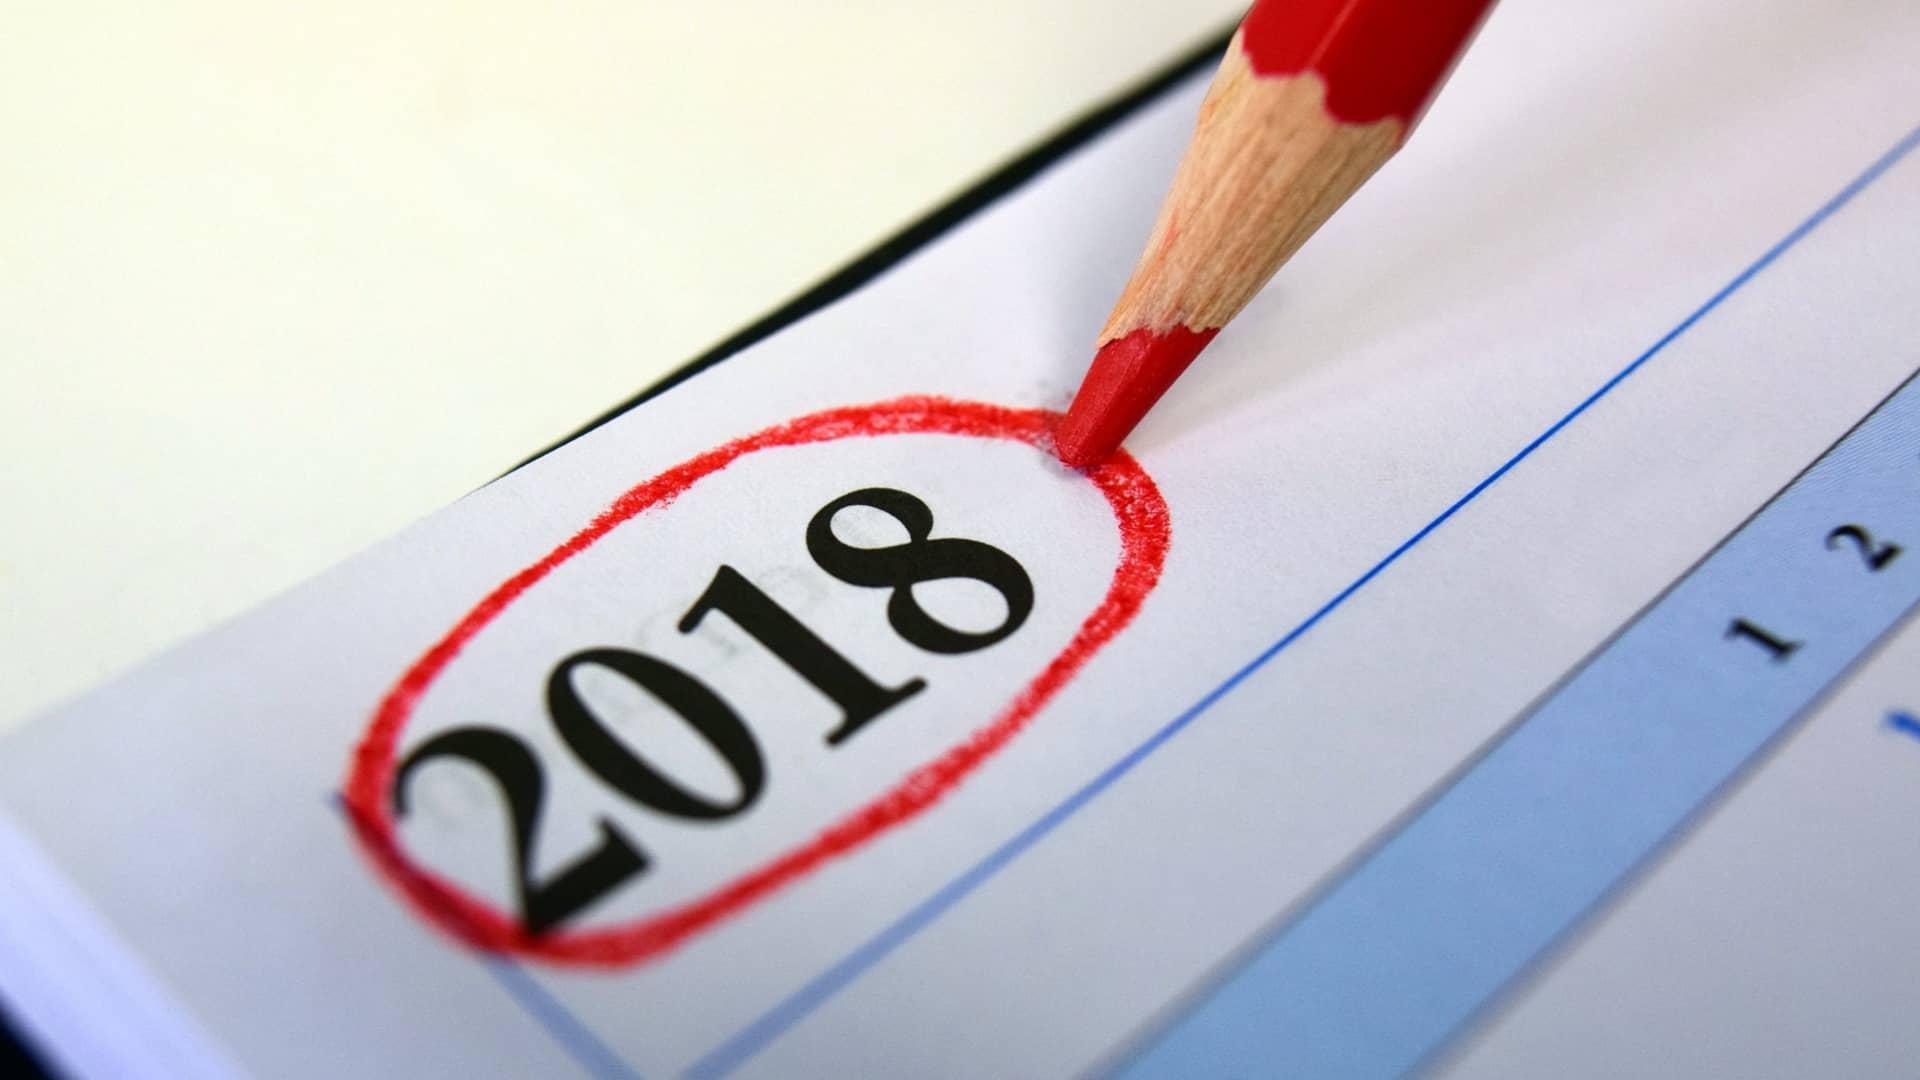 Kalender for 2018